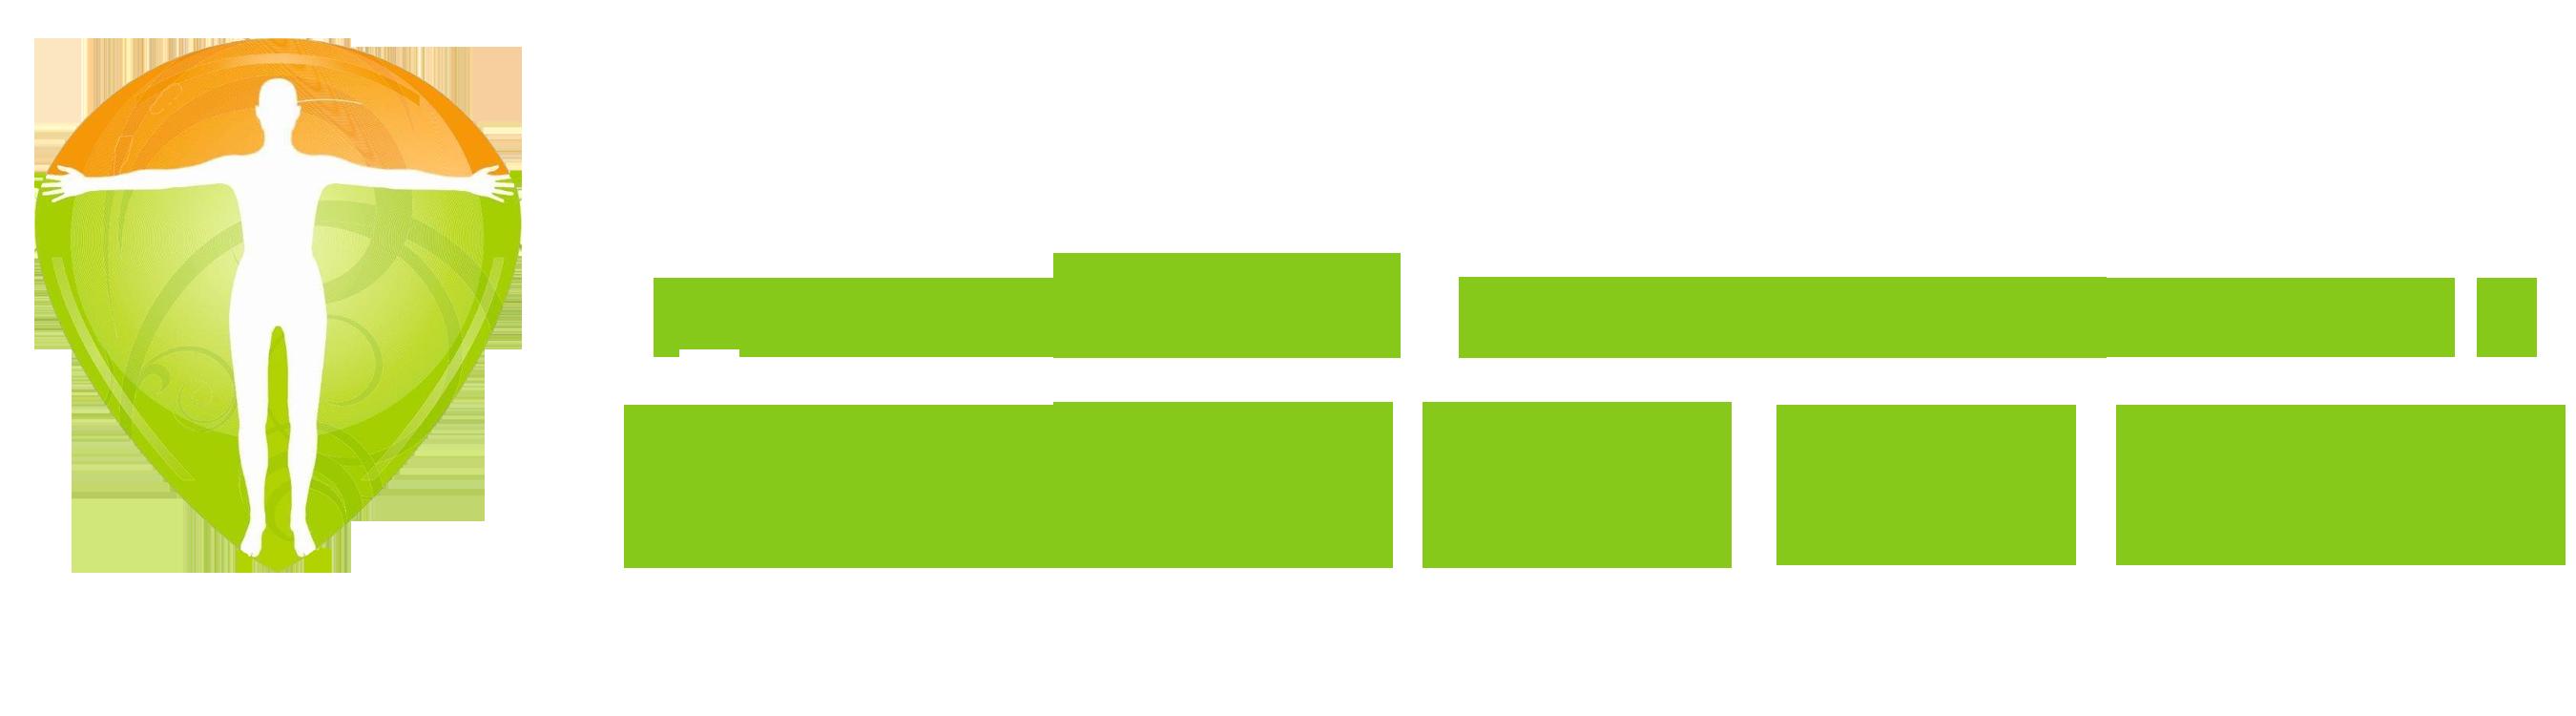 Pyhsiotherapie Scherdel